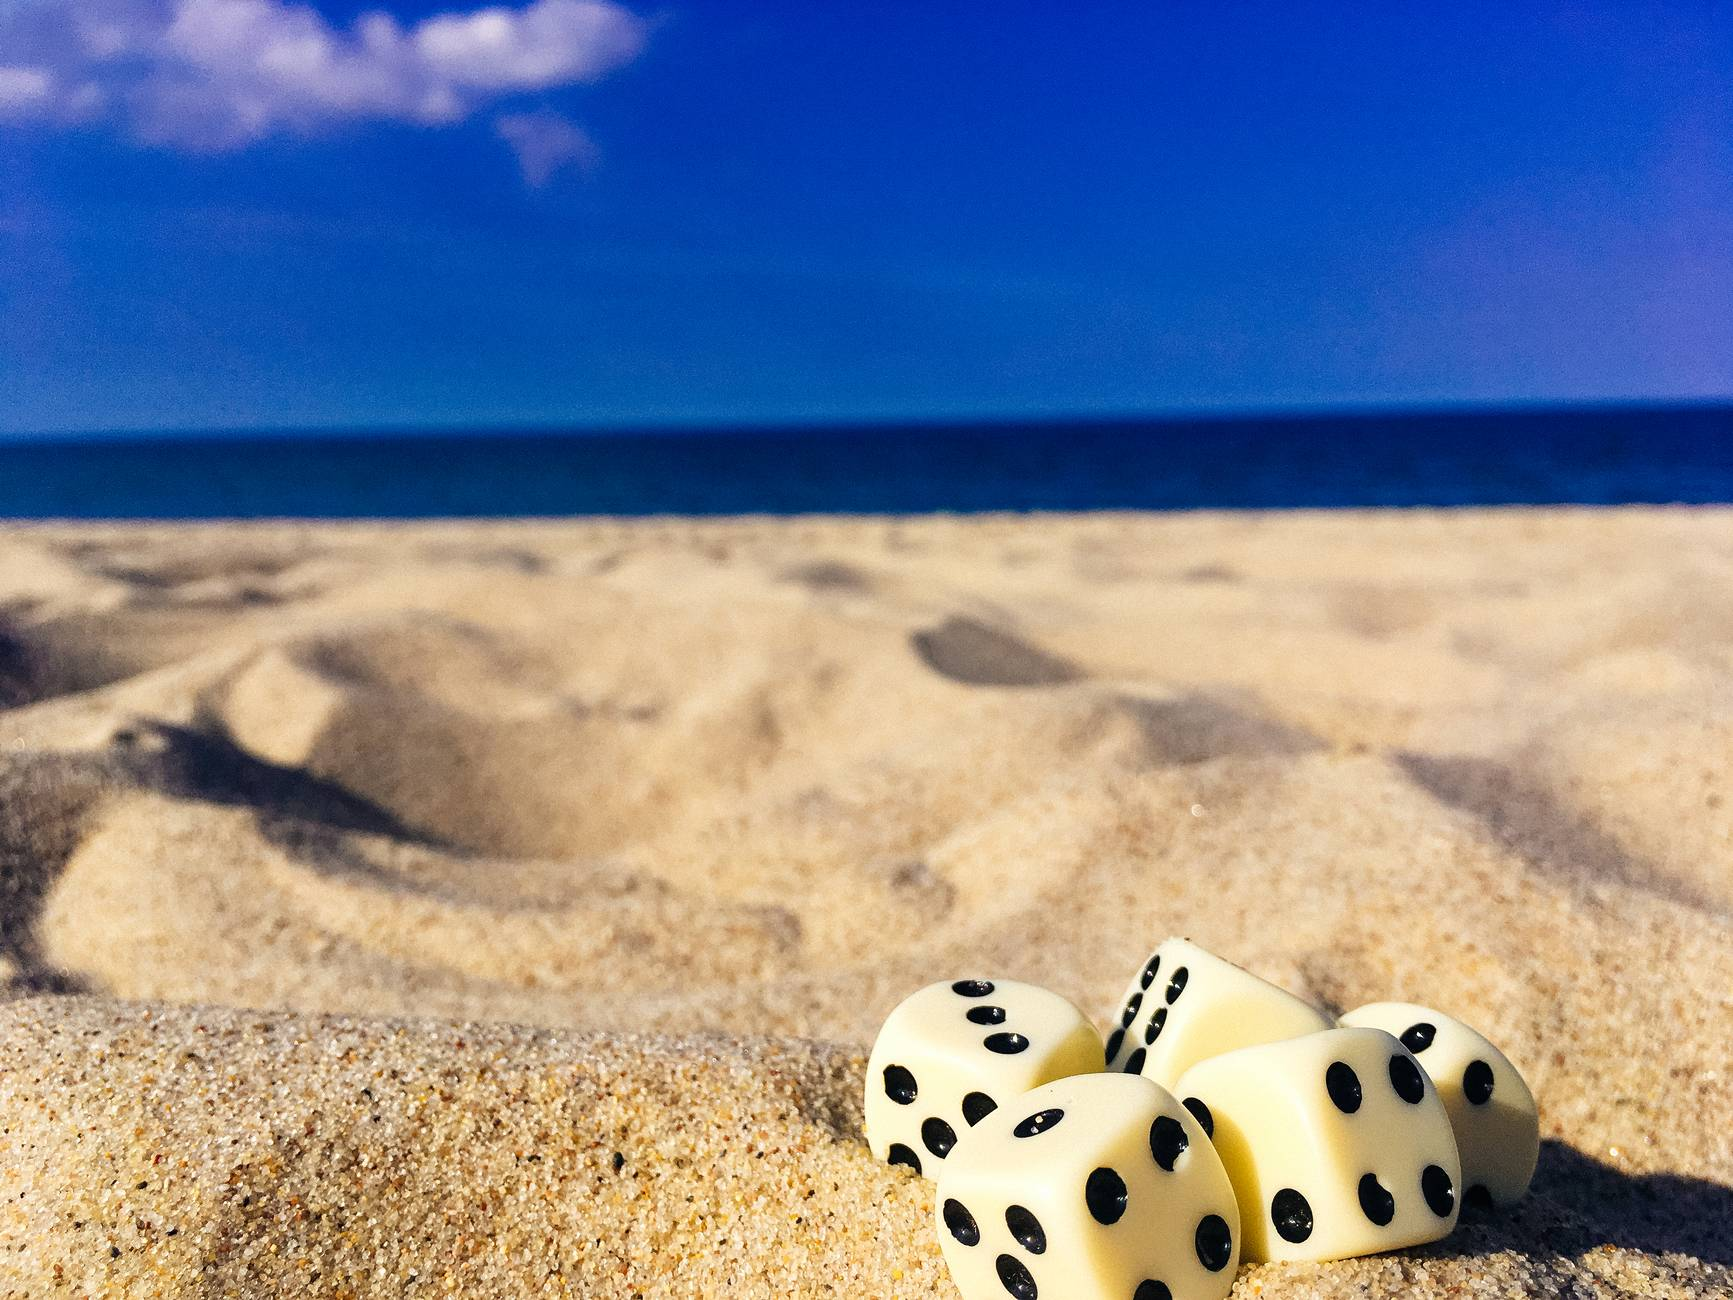 five dice on sand